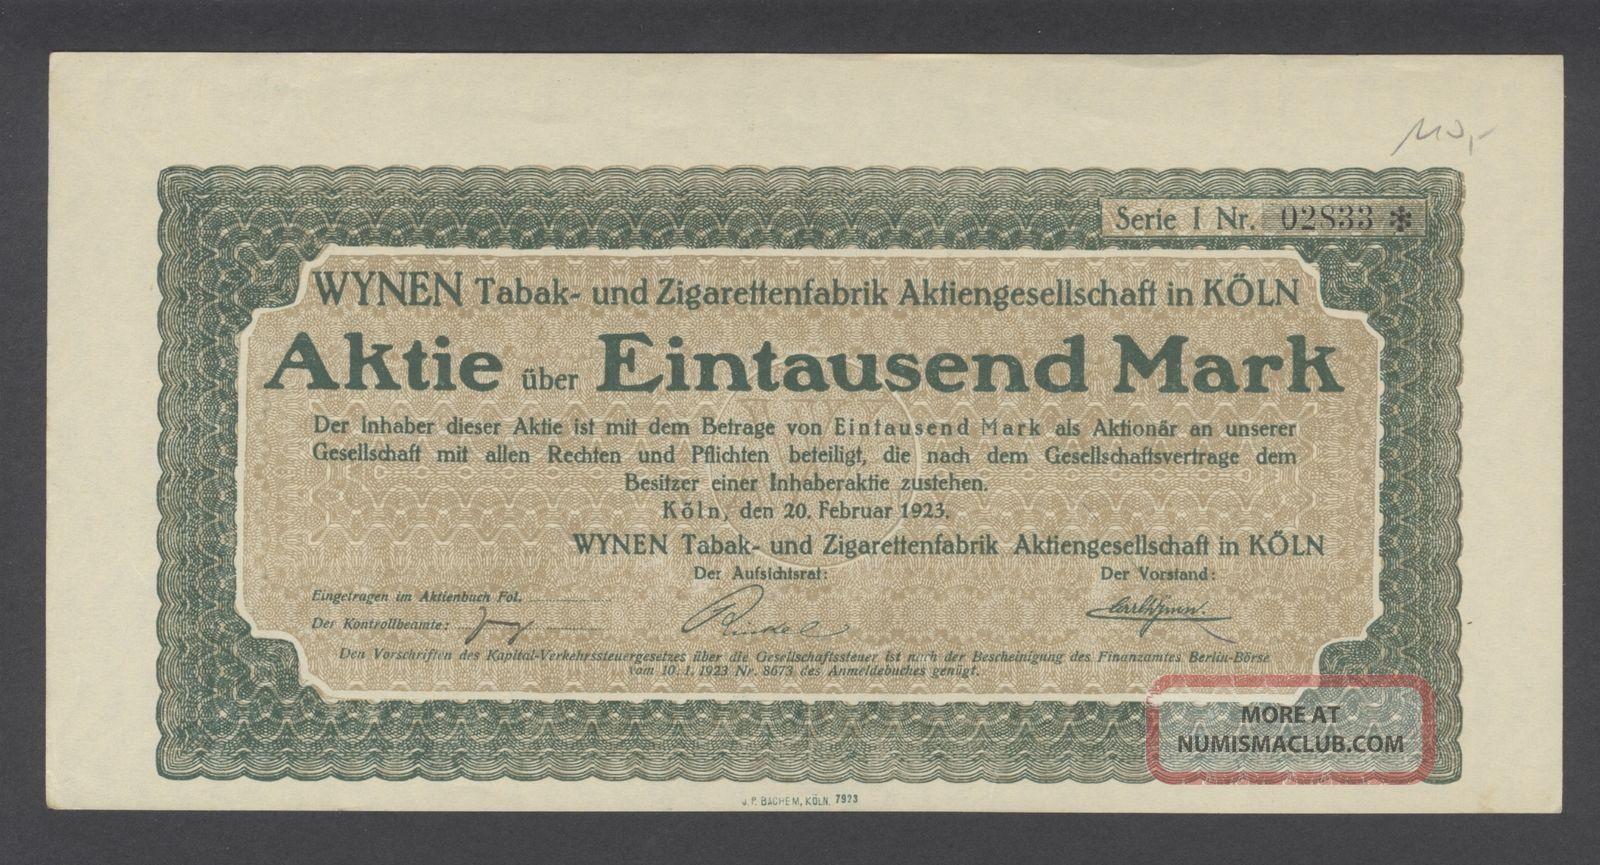 Germany 1923 Bond - Wynen Tabak Und Zigarettenfabrik Koln. . .  A1512 World photo